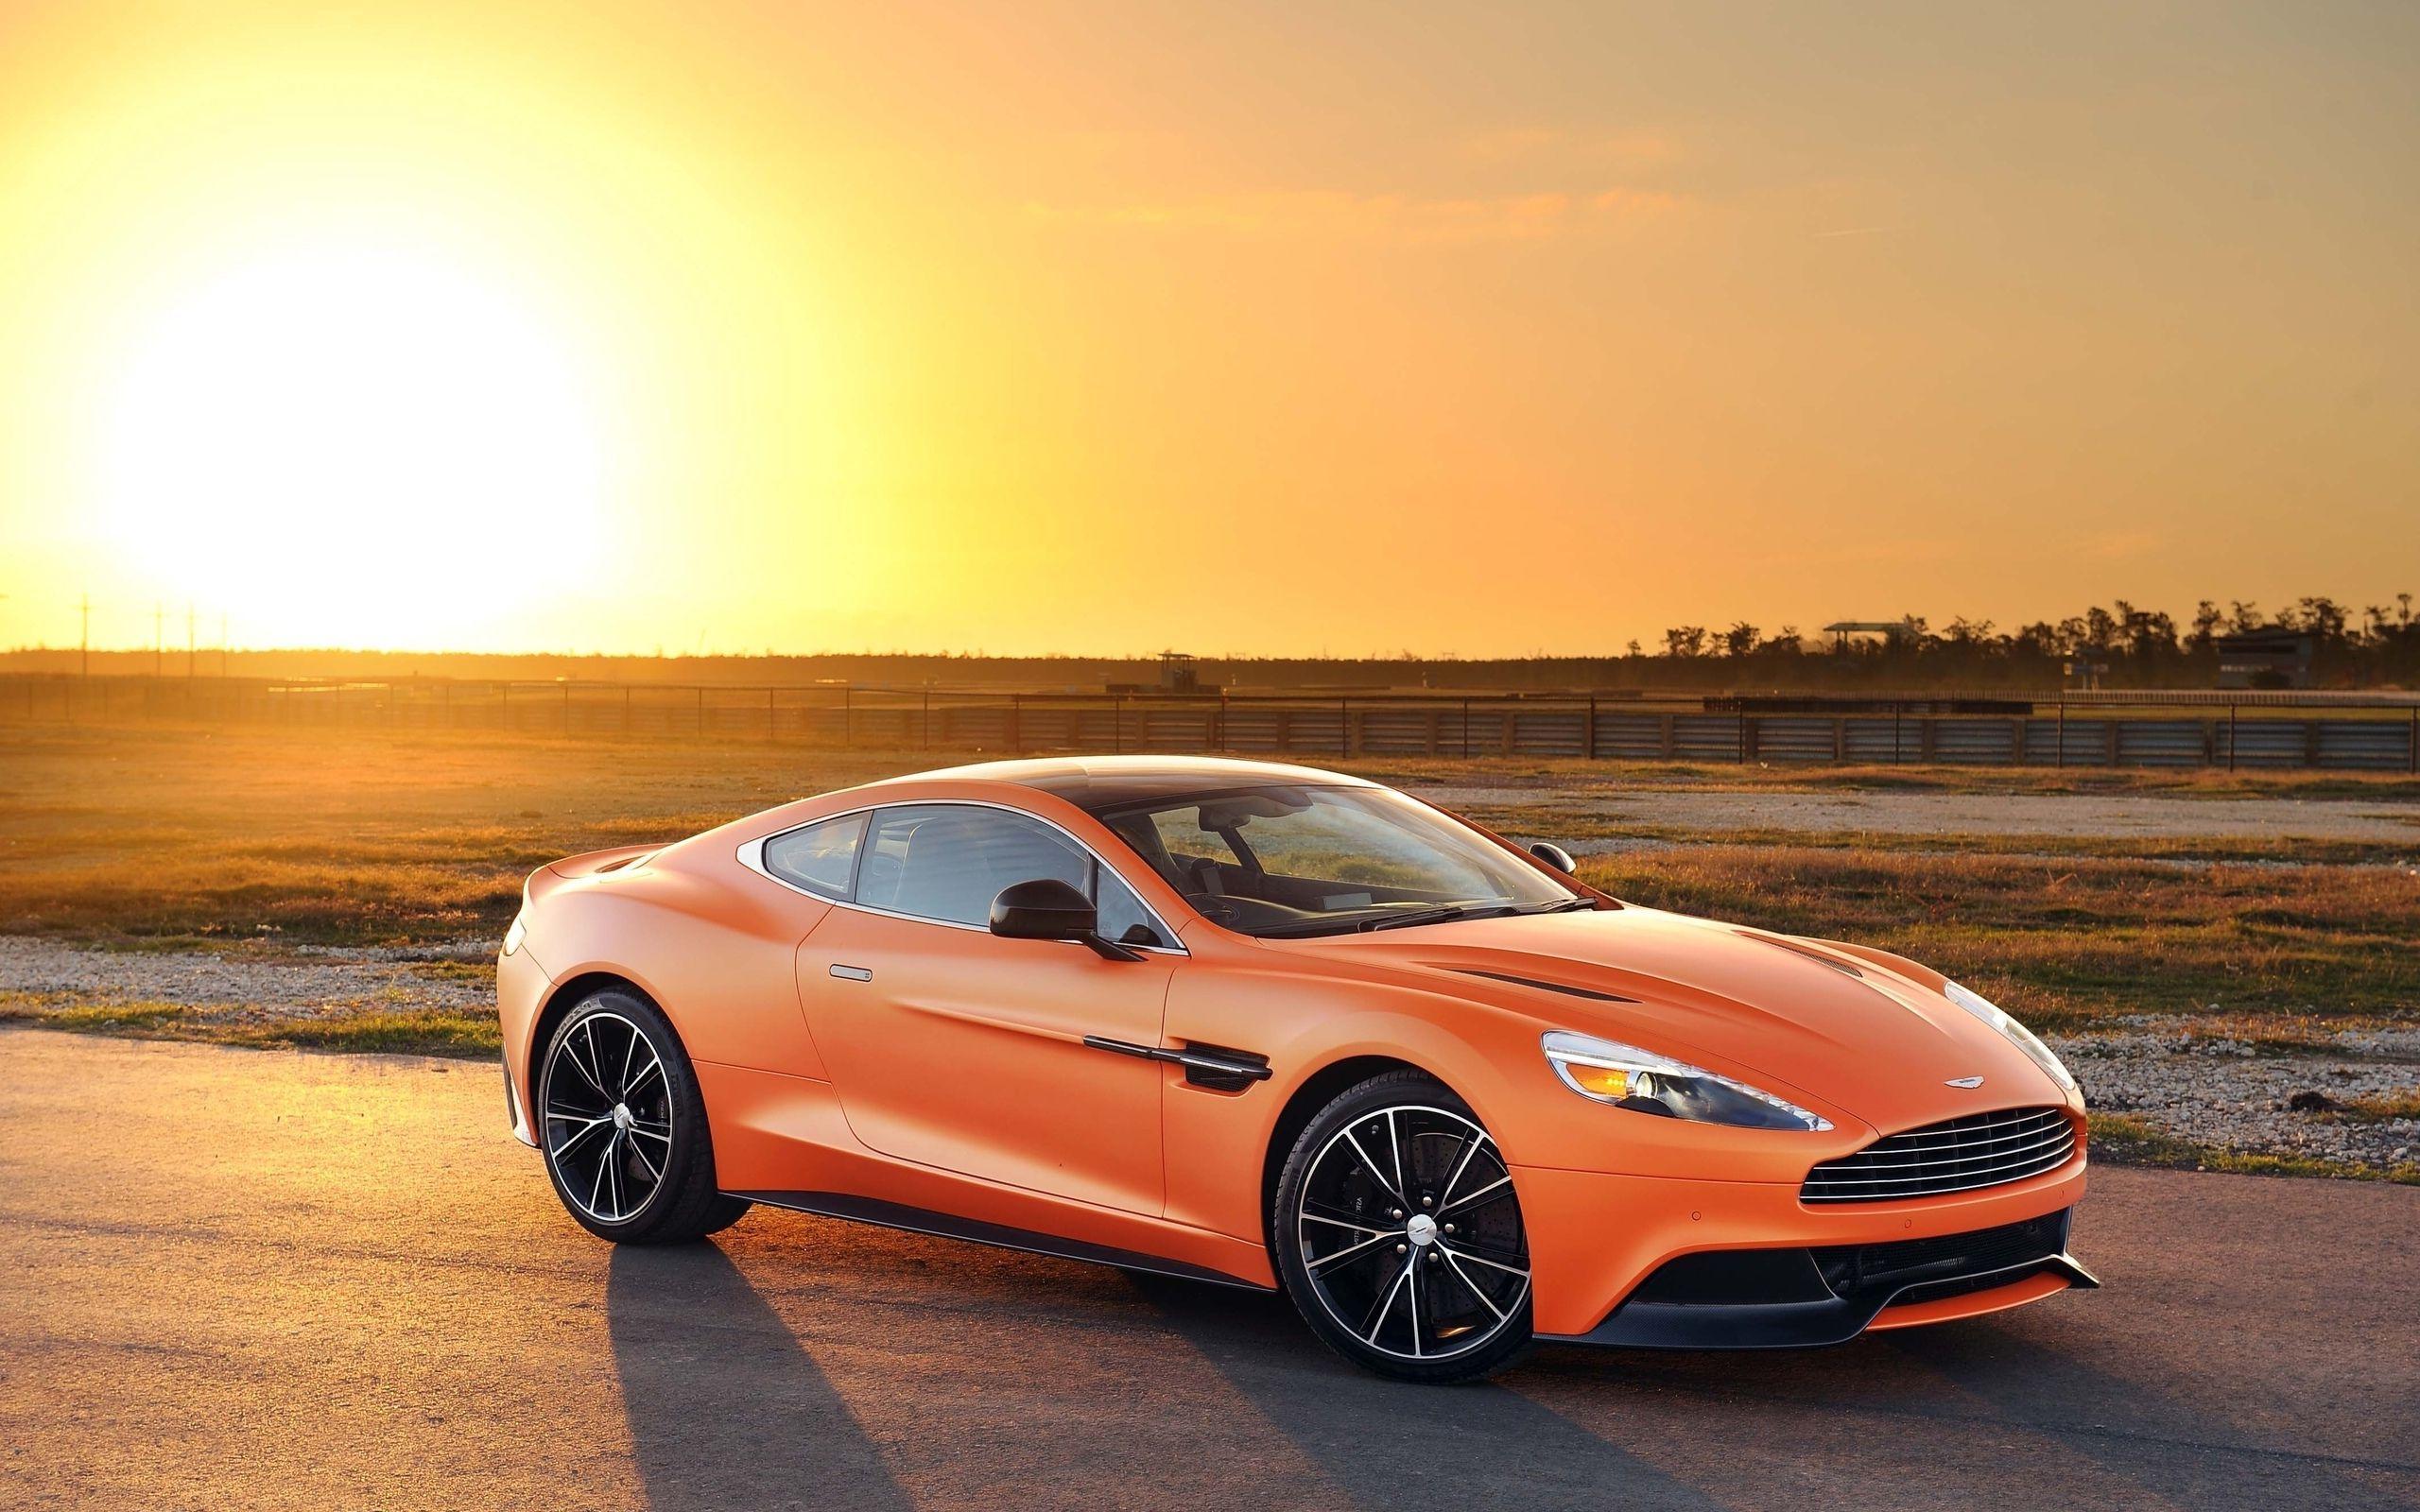 Aston Martin Vanquish Wallpaper 2560x1600